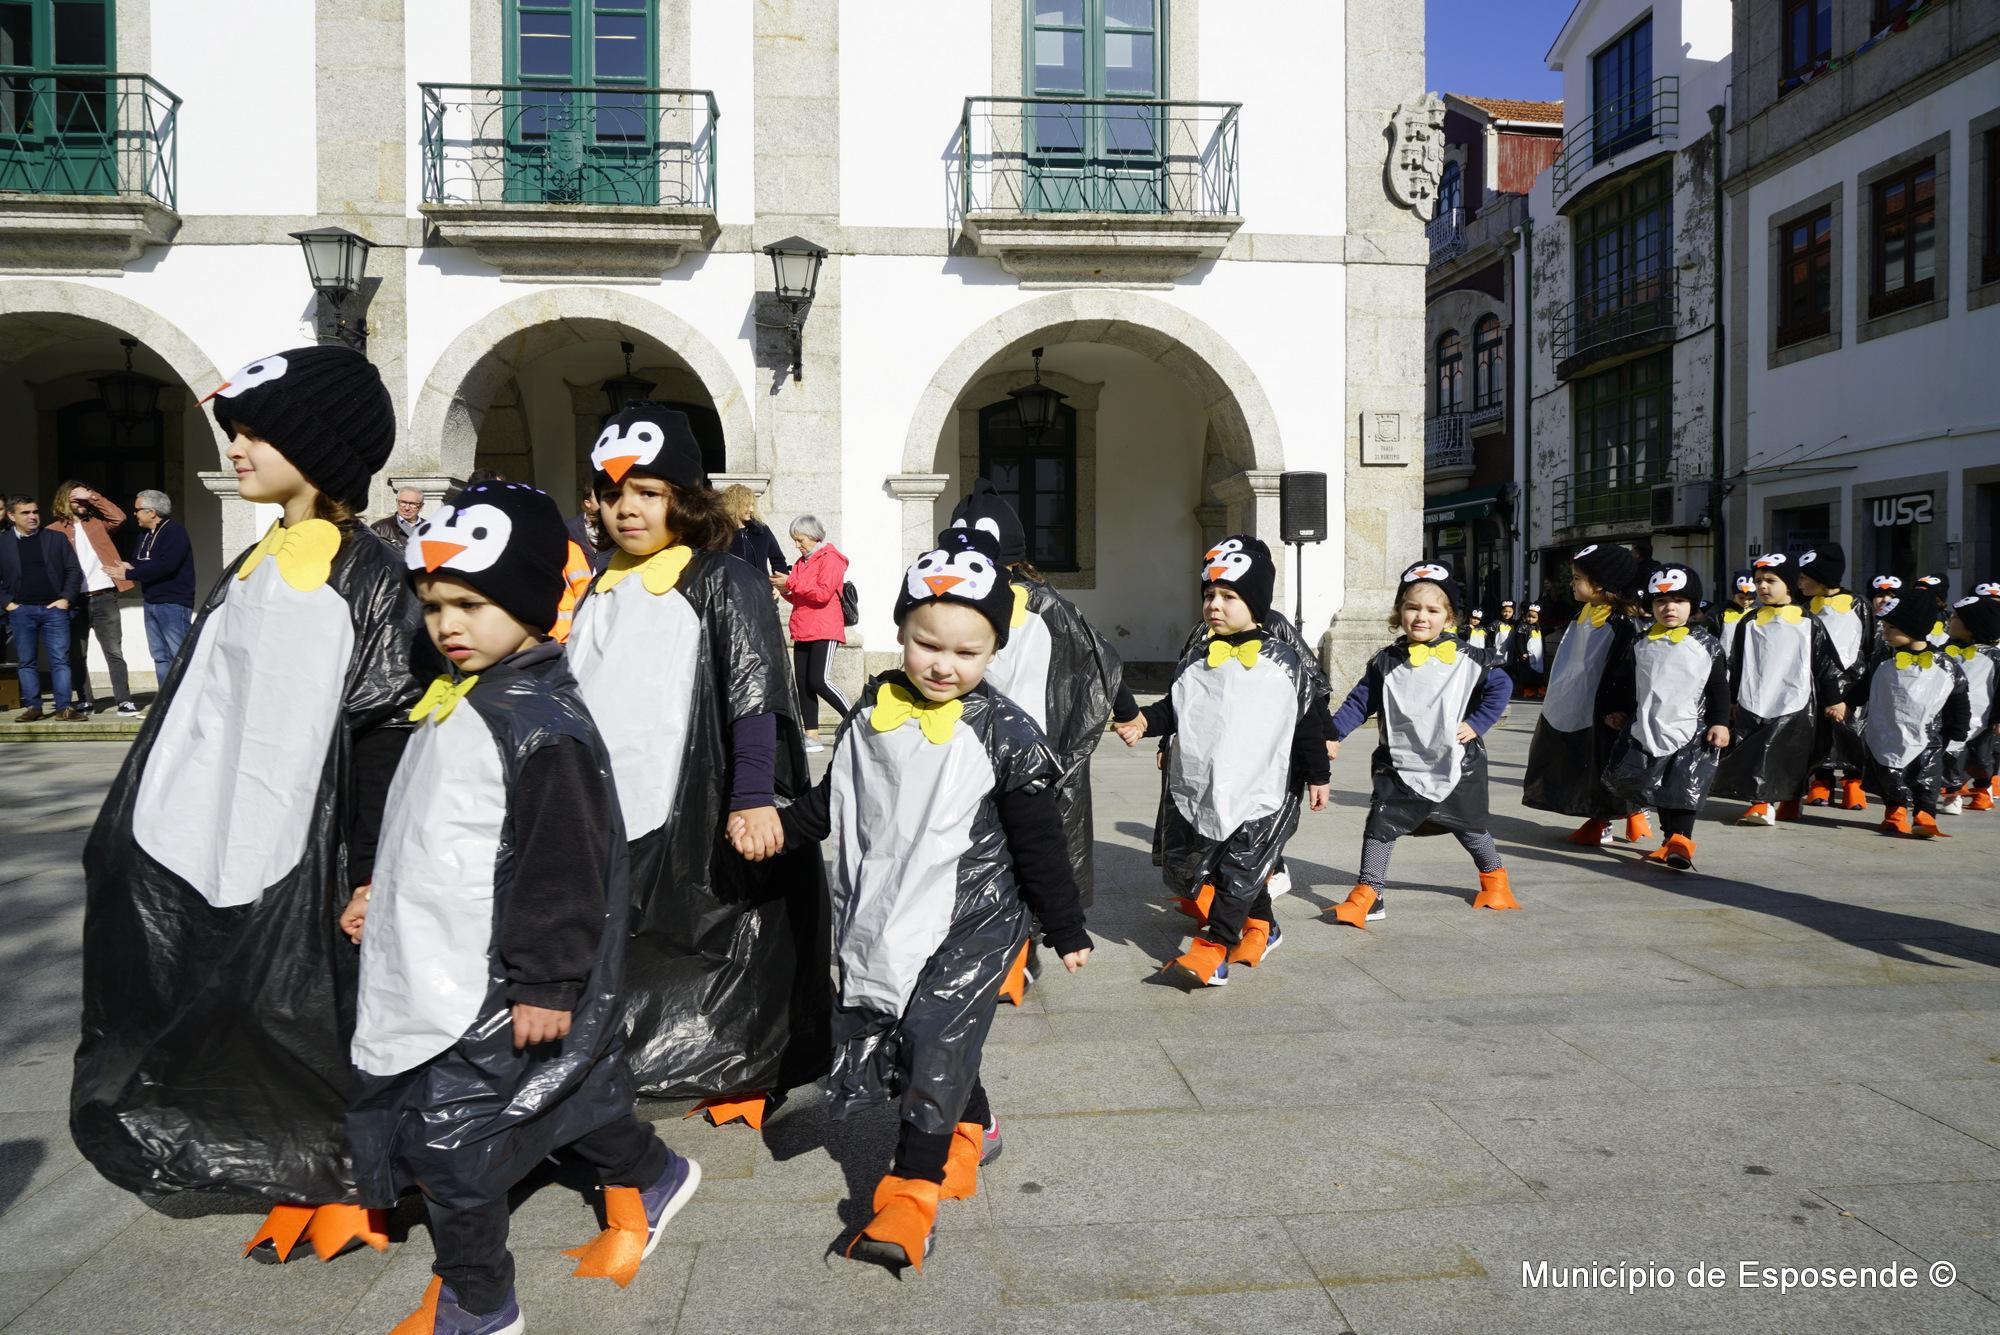 Carnaval Promove Sensibilização Ambiental